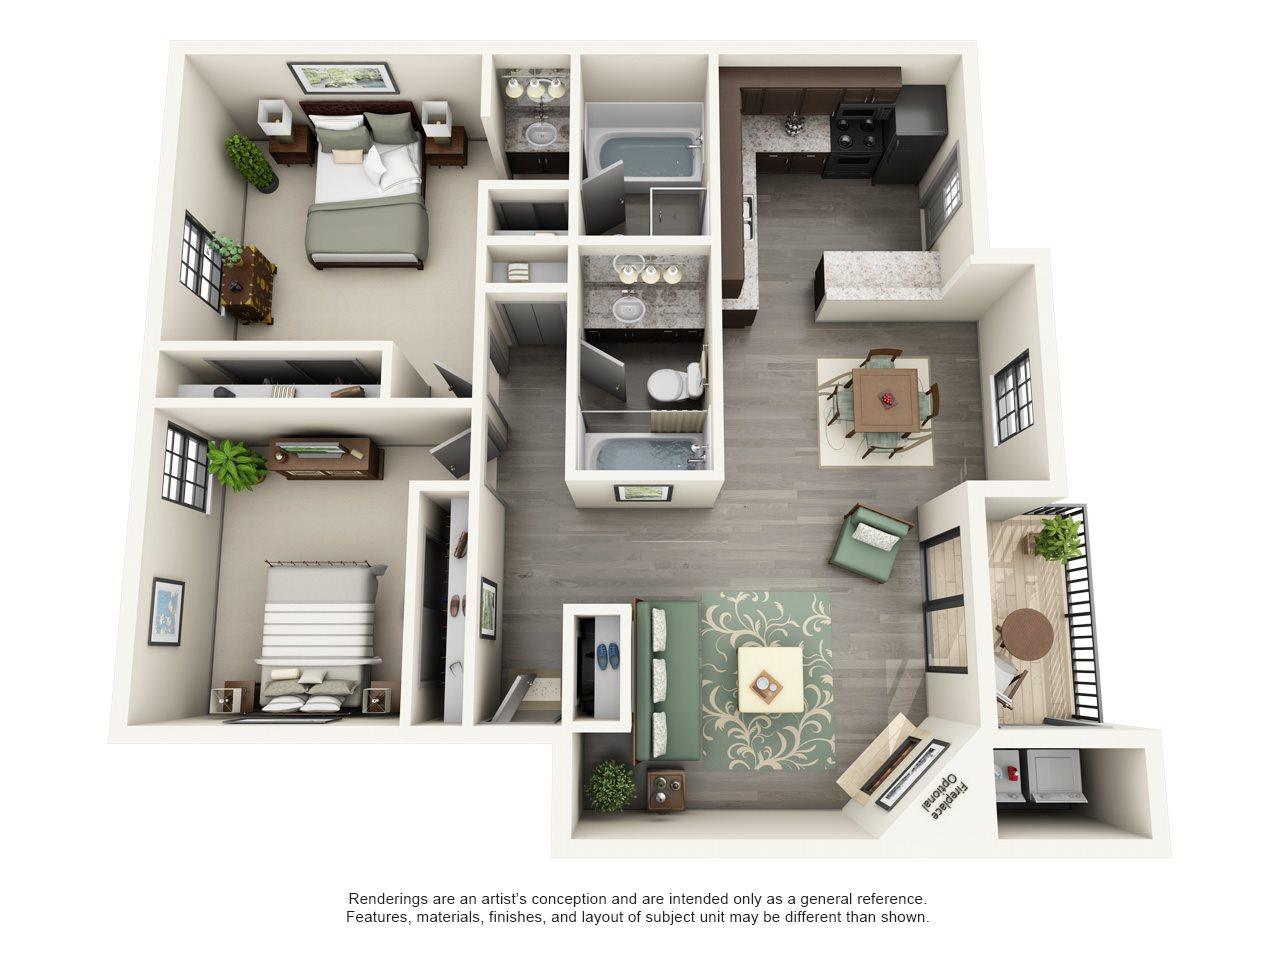 Calloway at Las Colinas Apartment Homes - 2 Bedroom 2 Bath Apartment